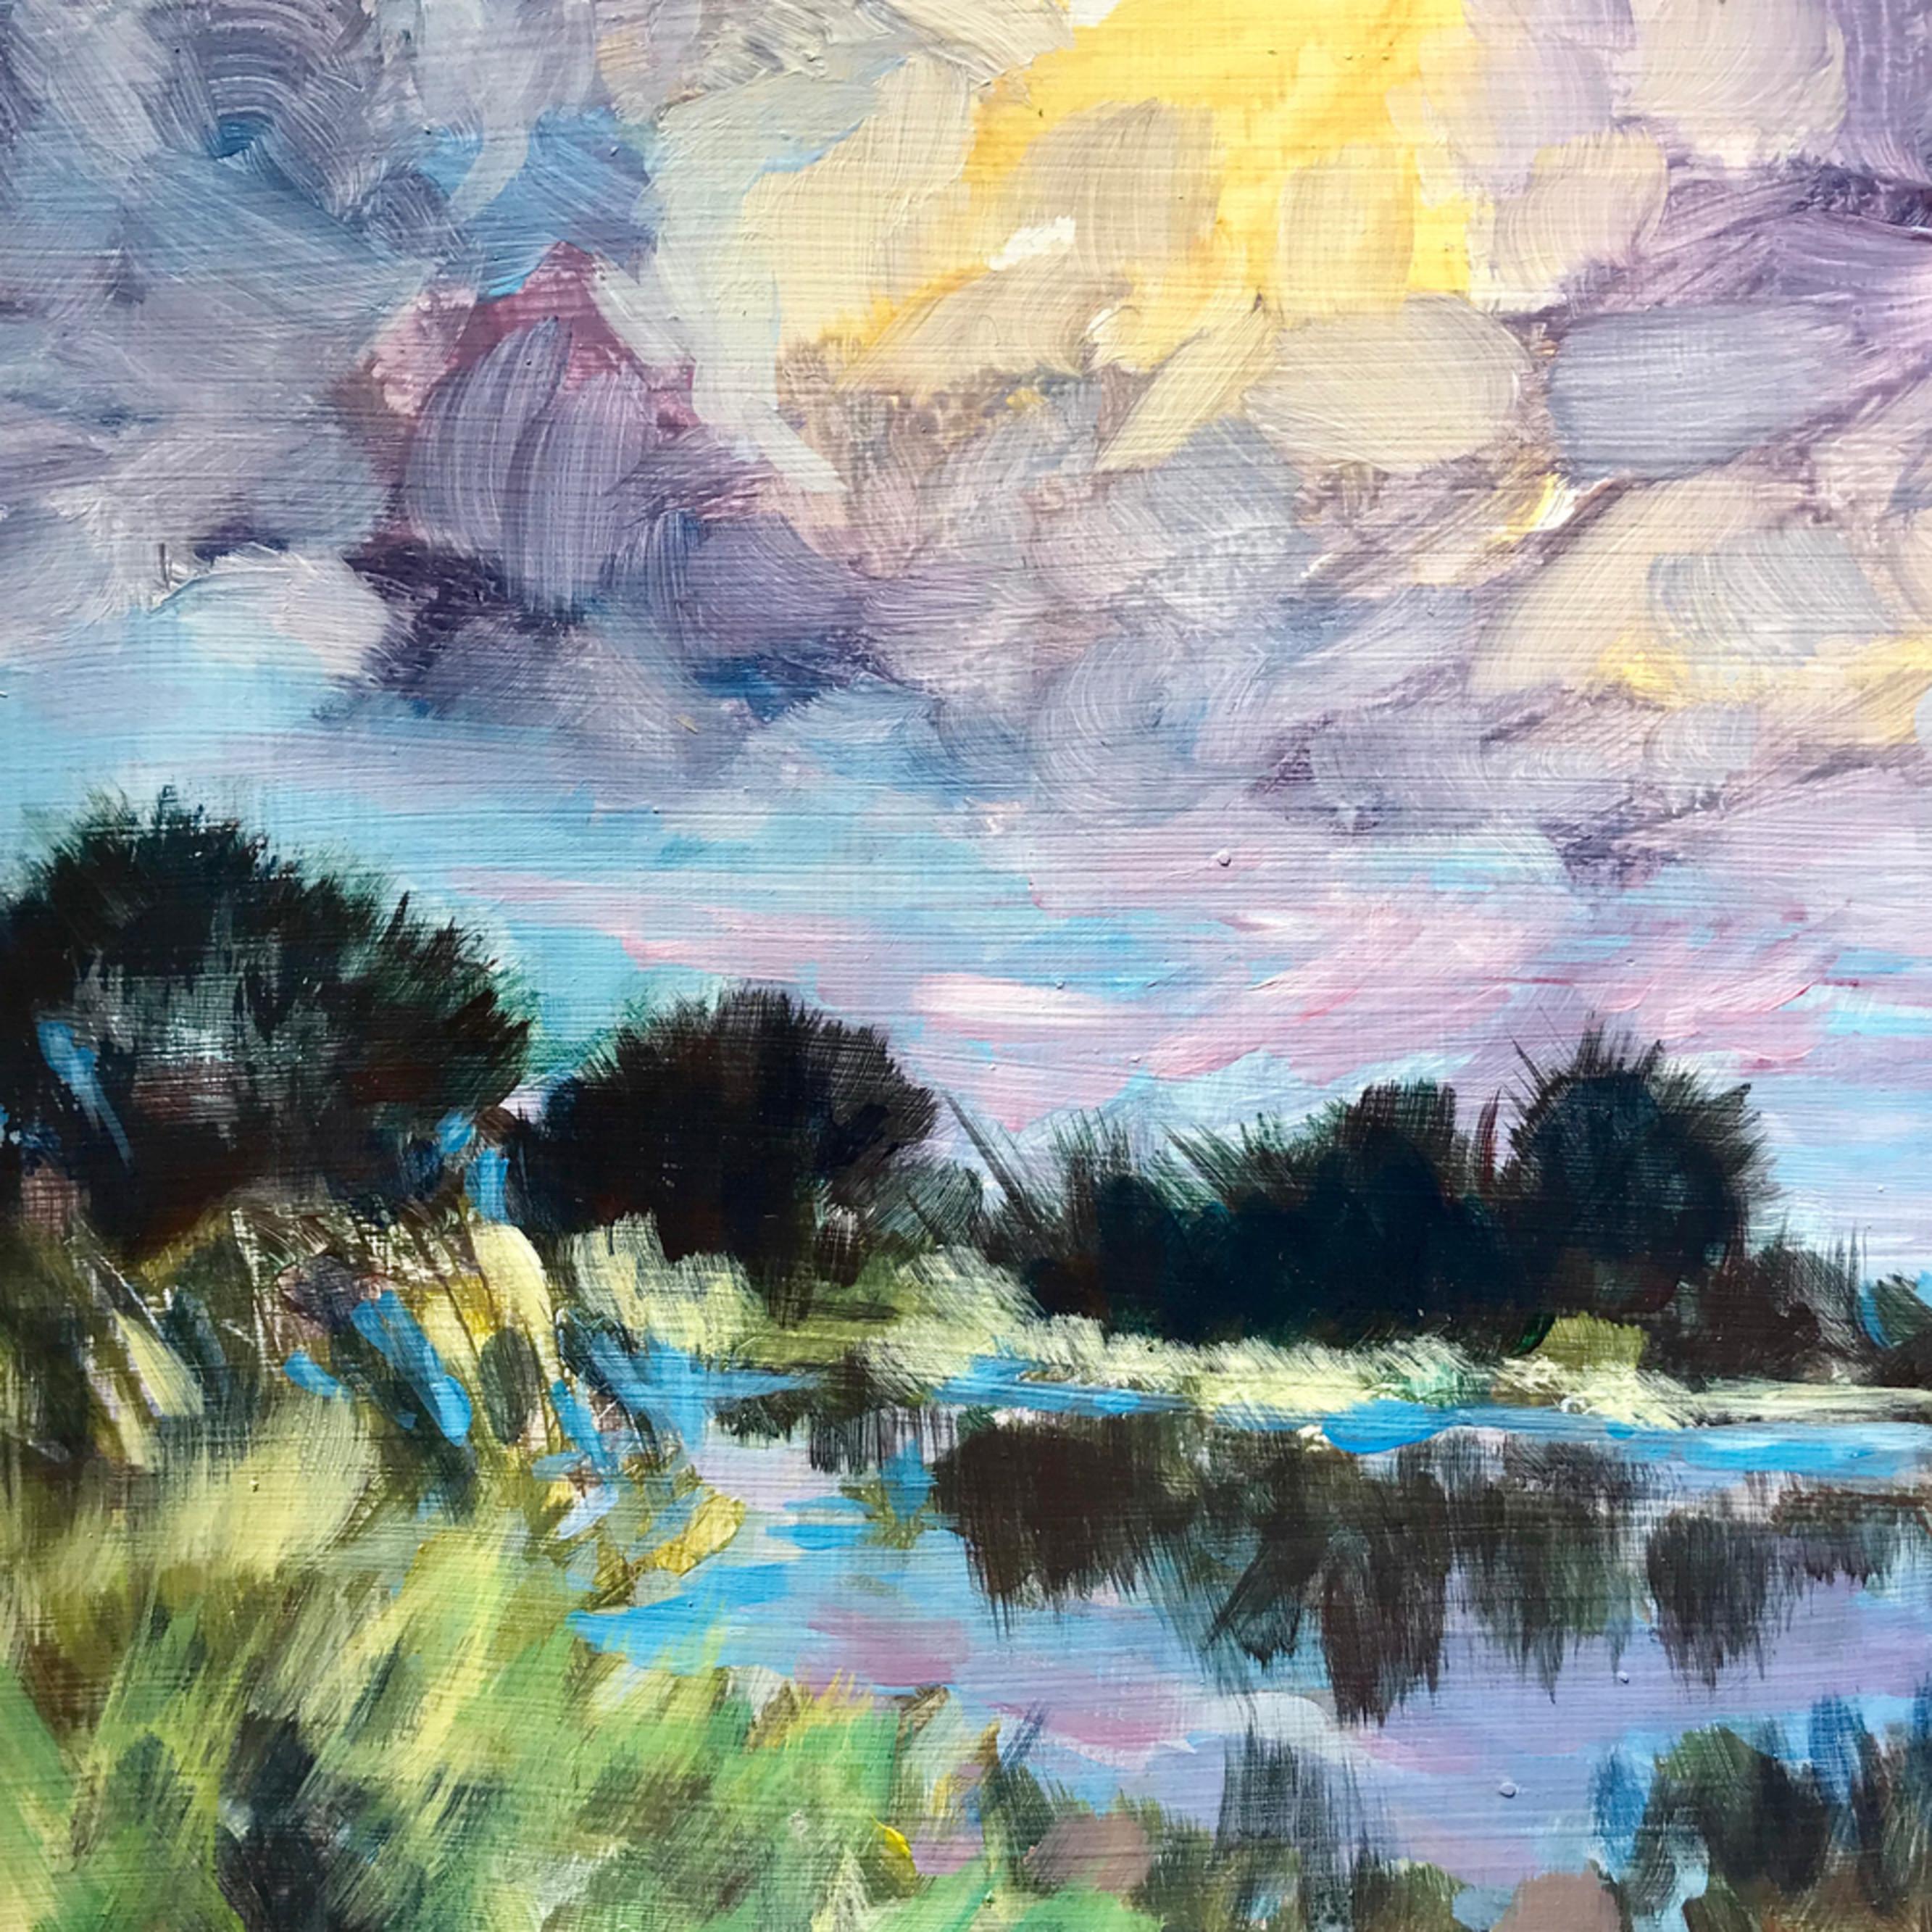 Holtb marsh scene acrylic 9 x 12 hicvnr